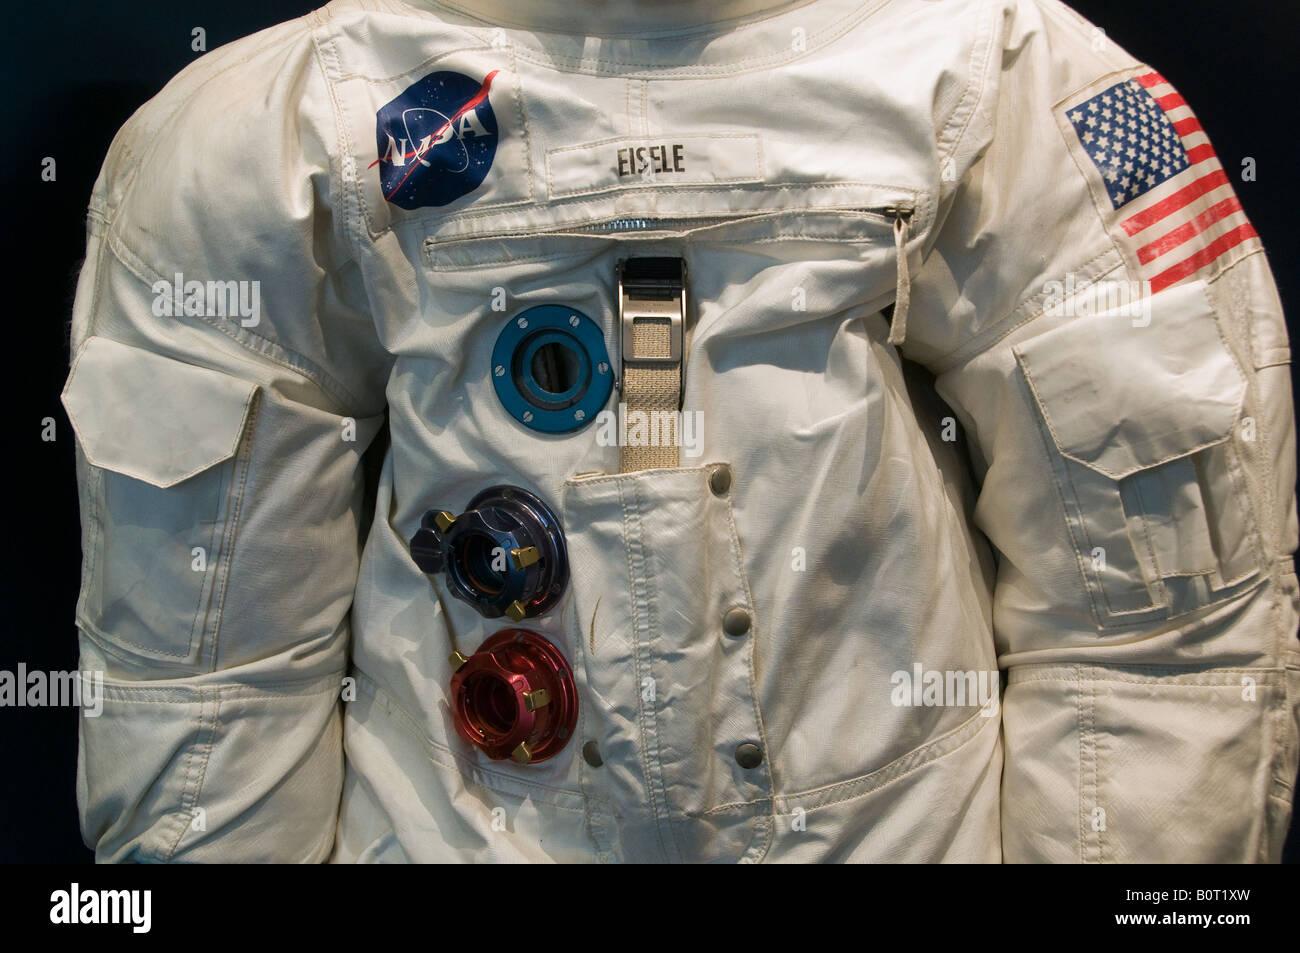 NASA astronaut spacesuit - Stock Image